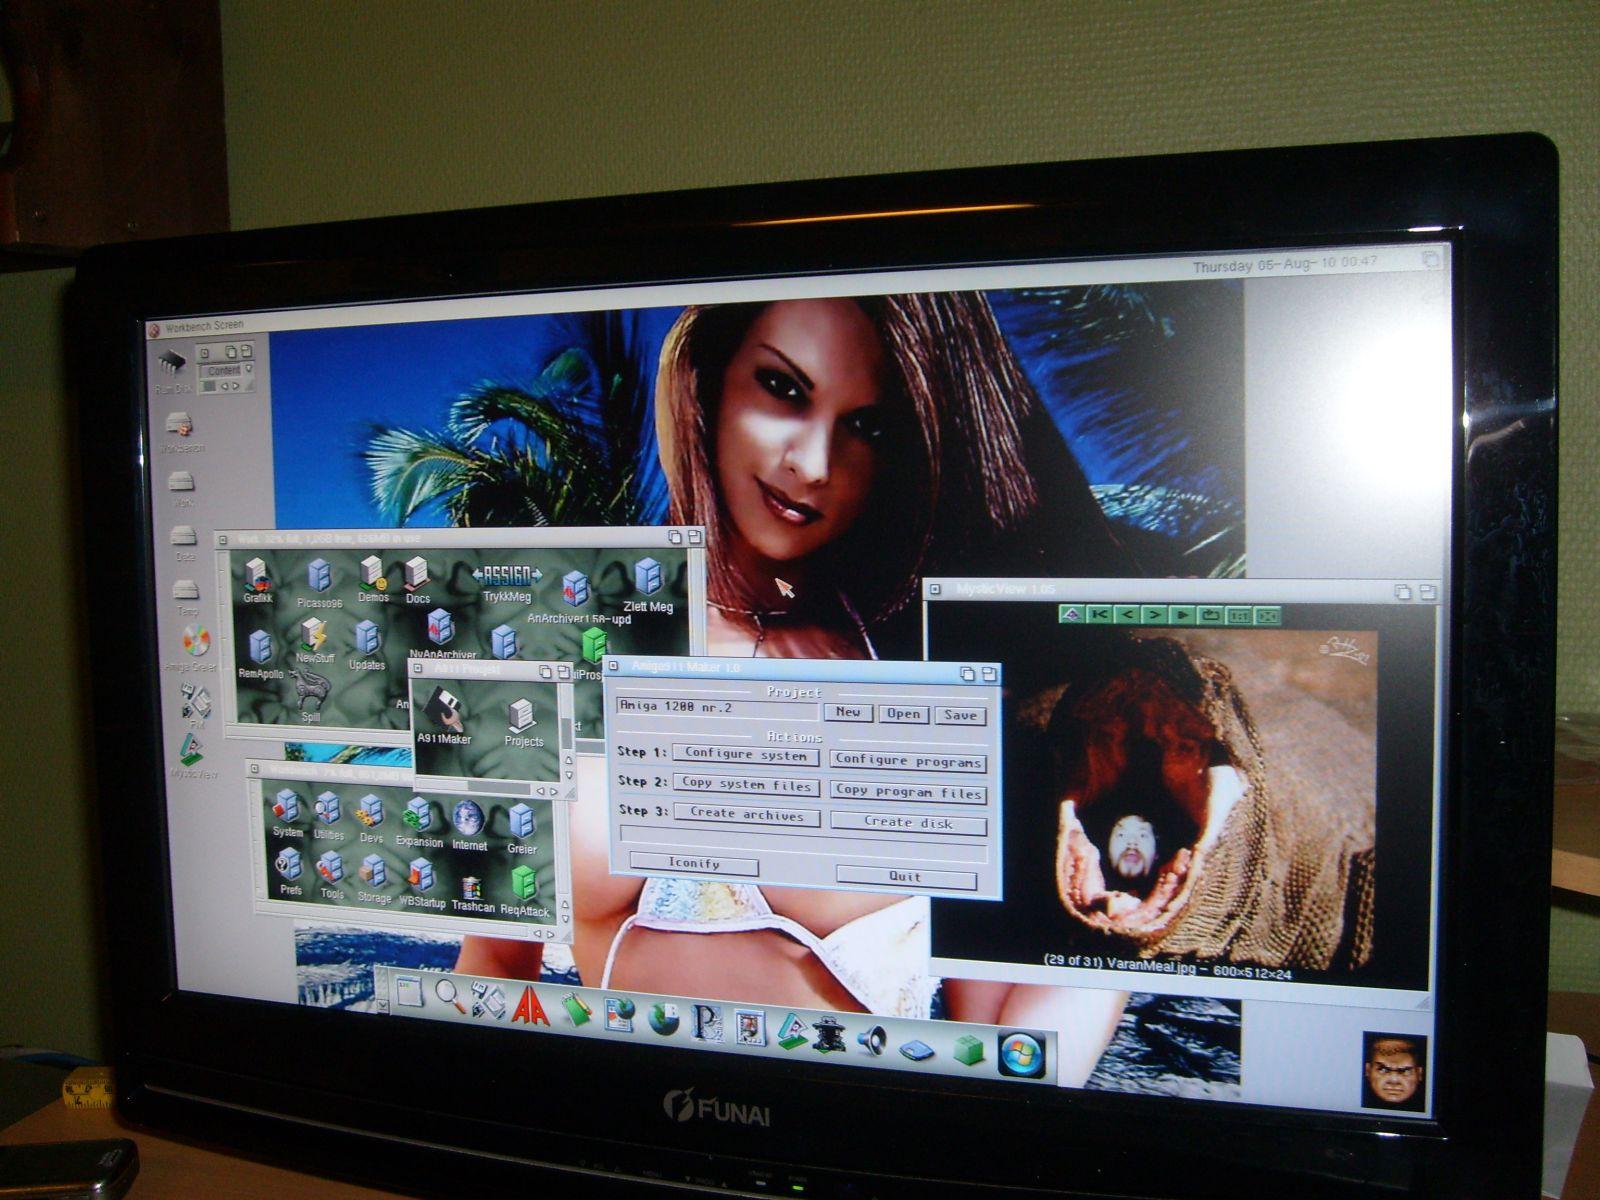 1360x768 Workbench screen on my new Funai 22